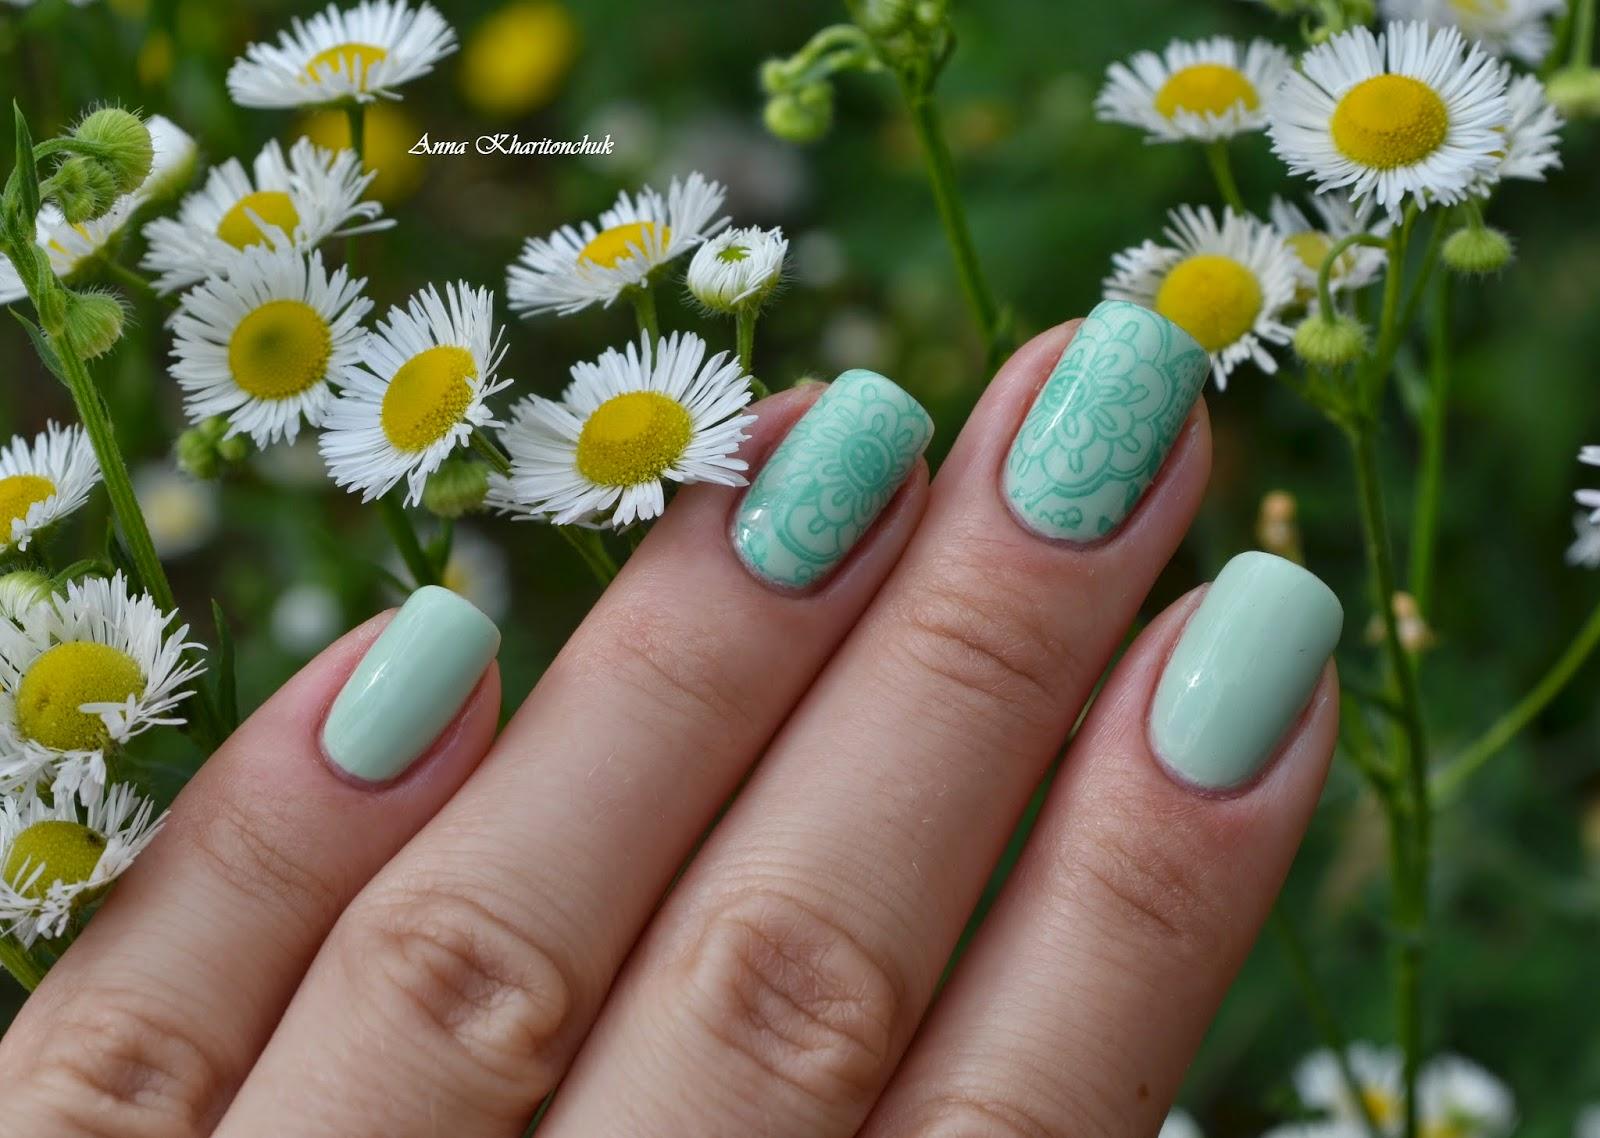 Oriflame Veryme Spring Tenderness Tend Green и стемпинг Born Pretty Store